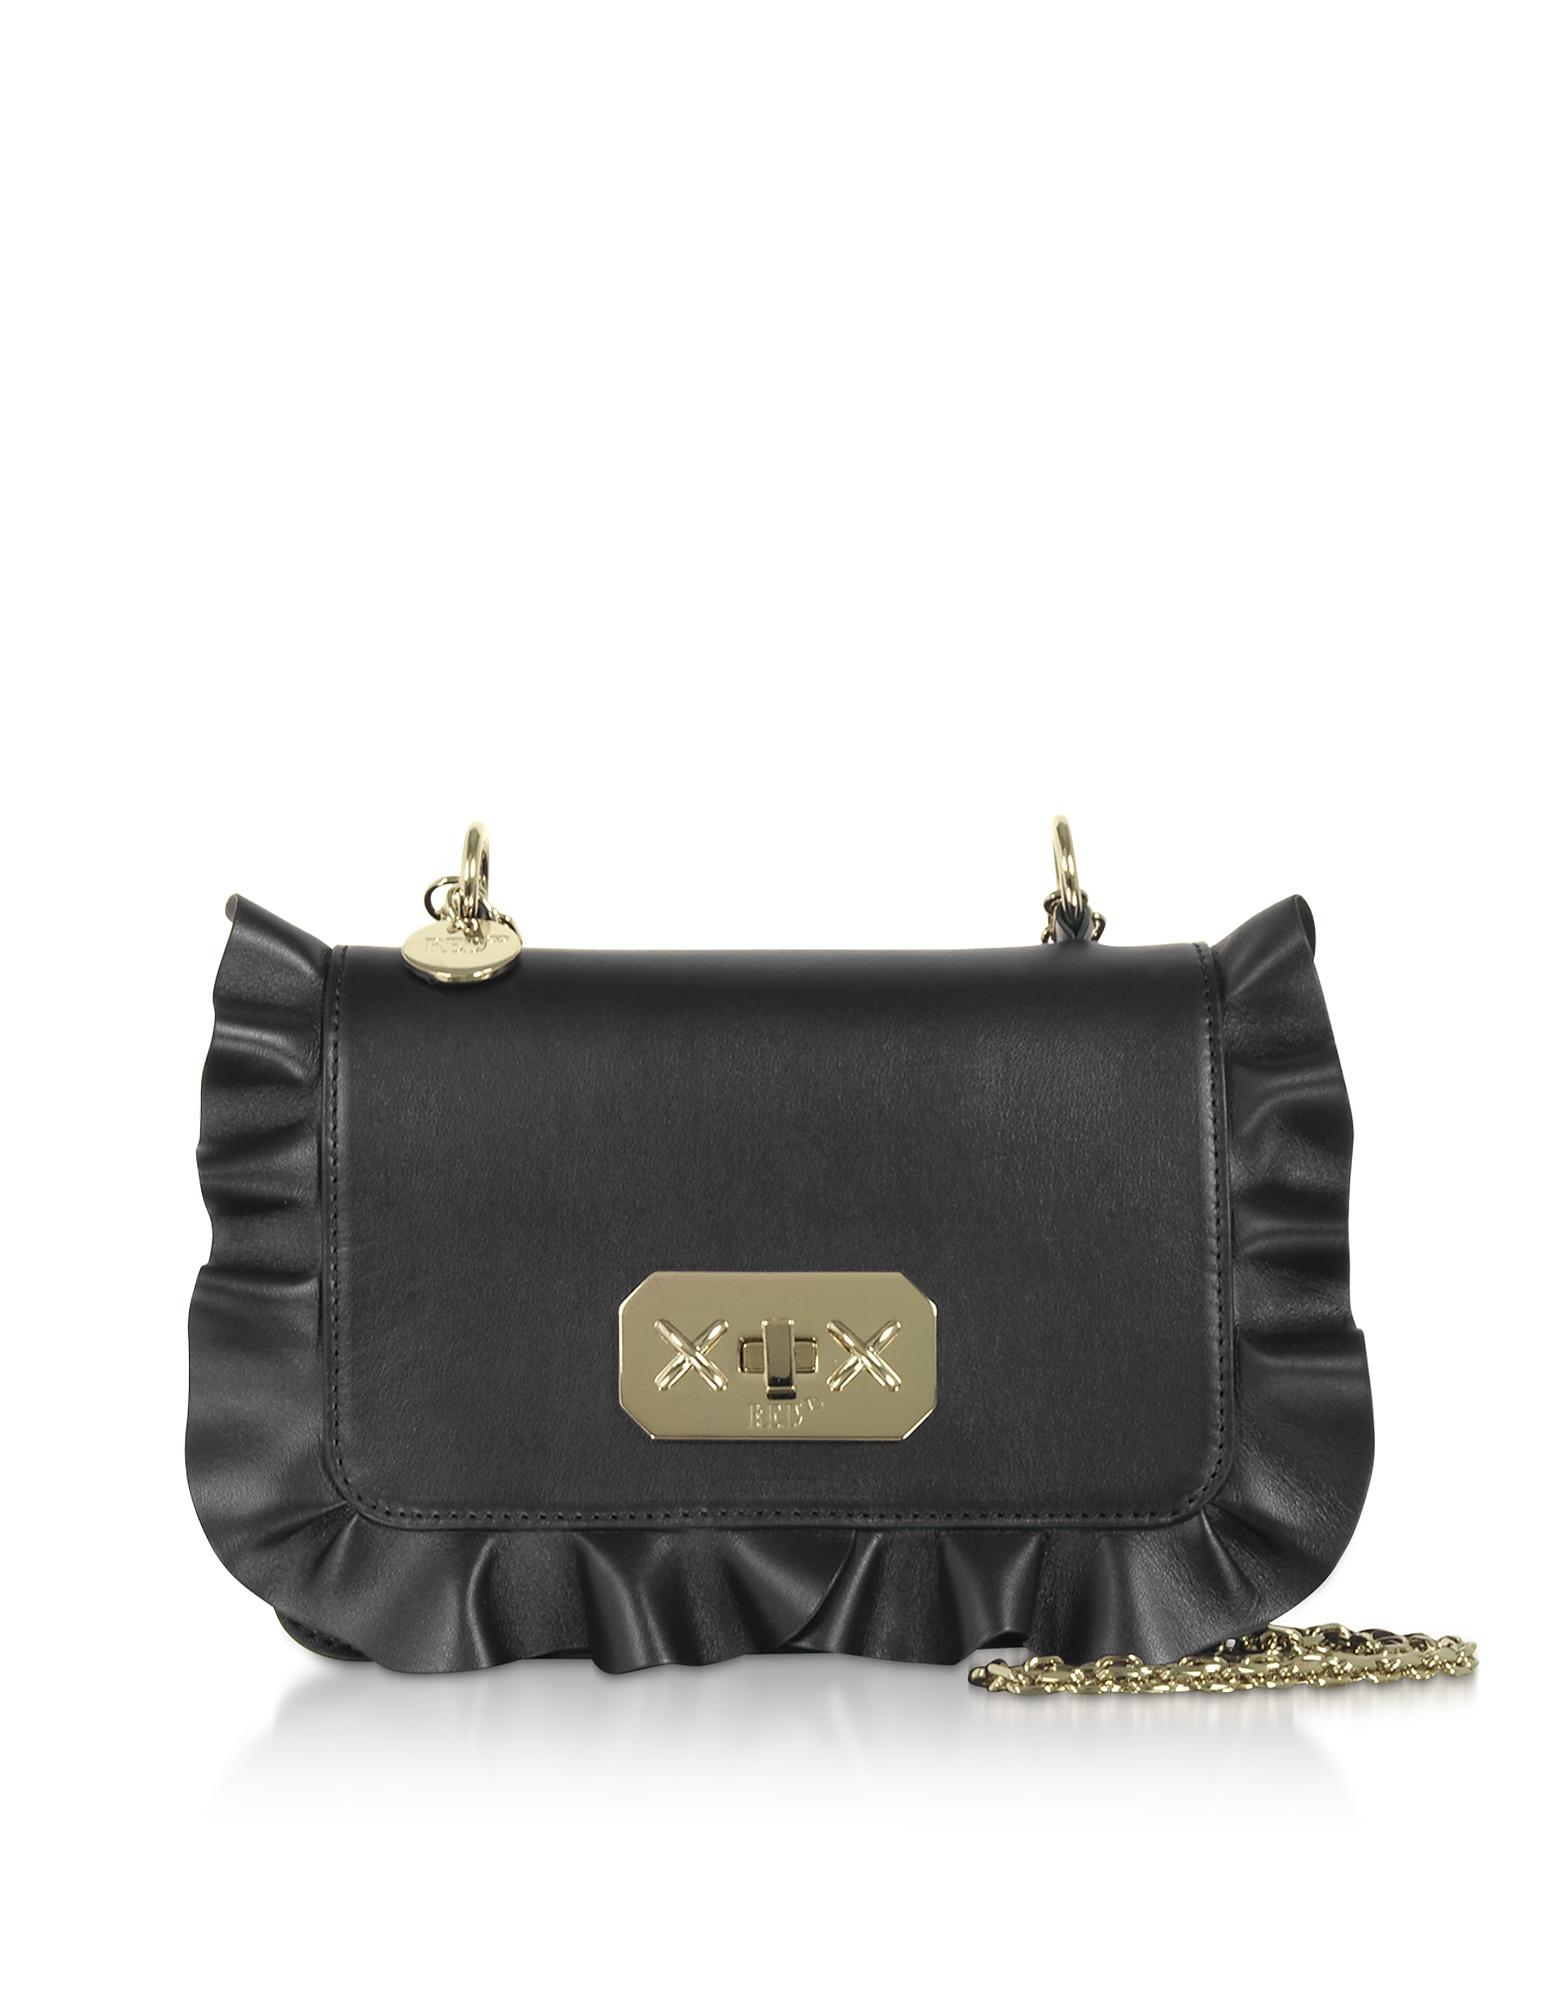 Rock Ruffles Shoulder Bag w/ Gold Chain Strap